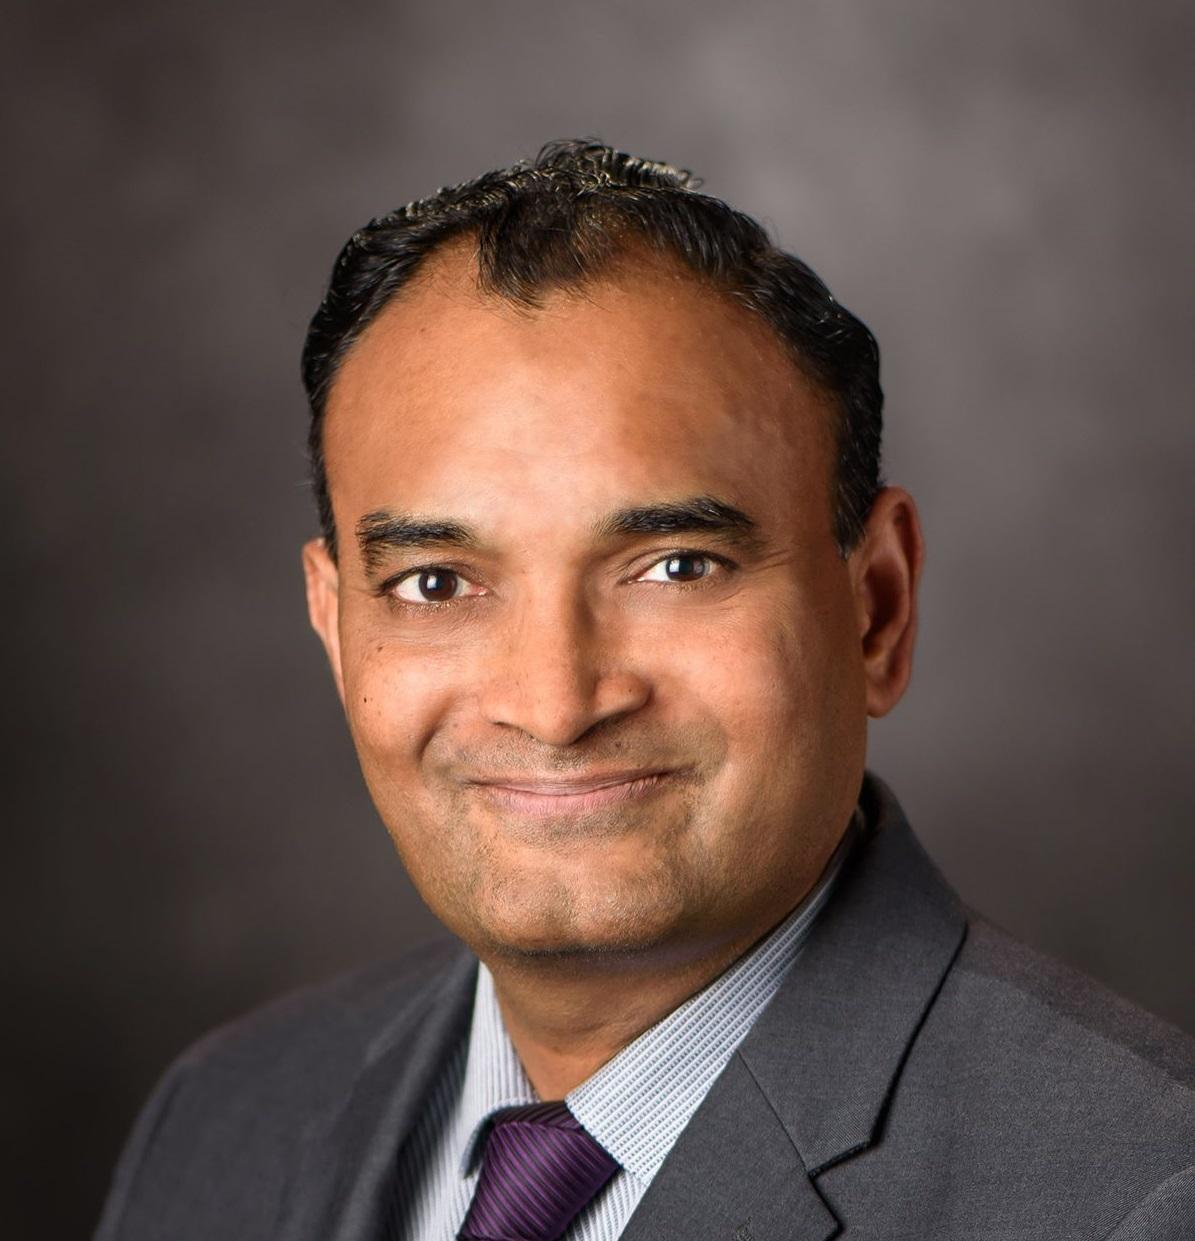 Dr. Swaminathan P Iyer